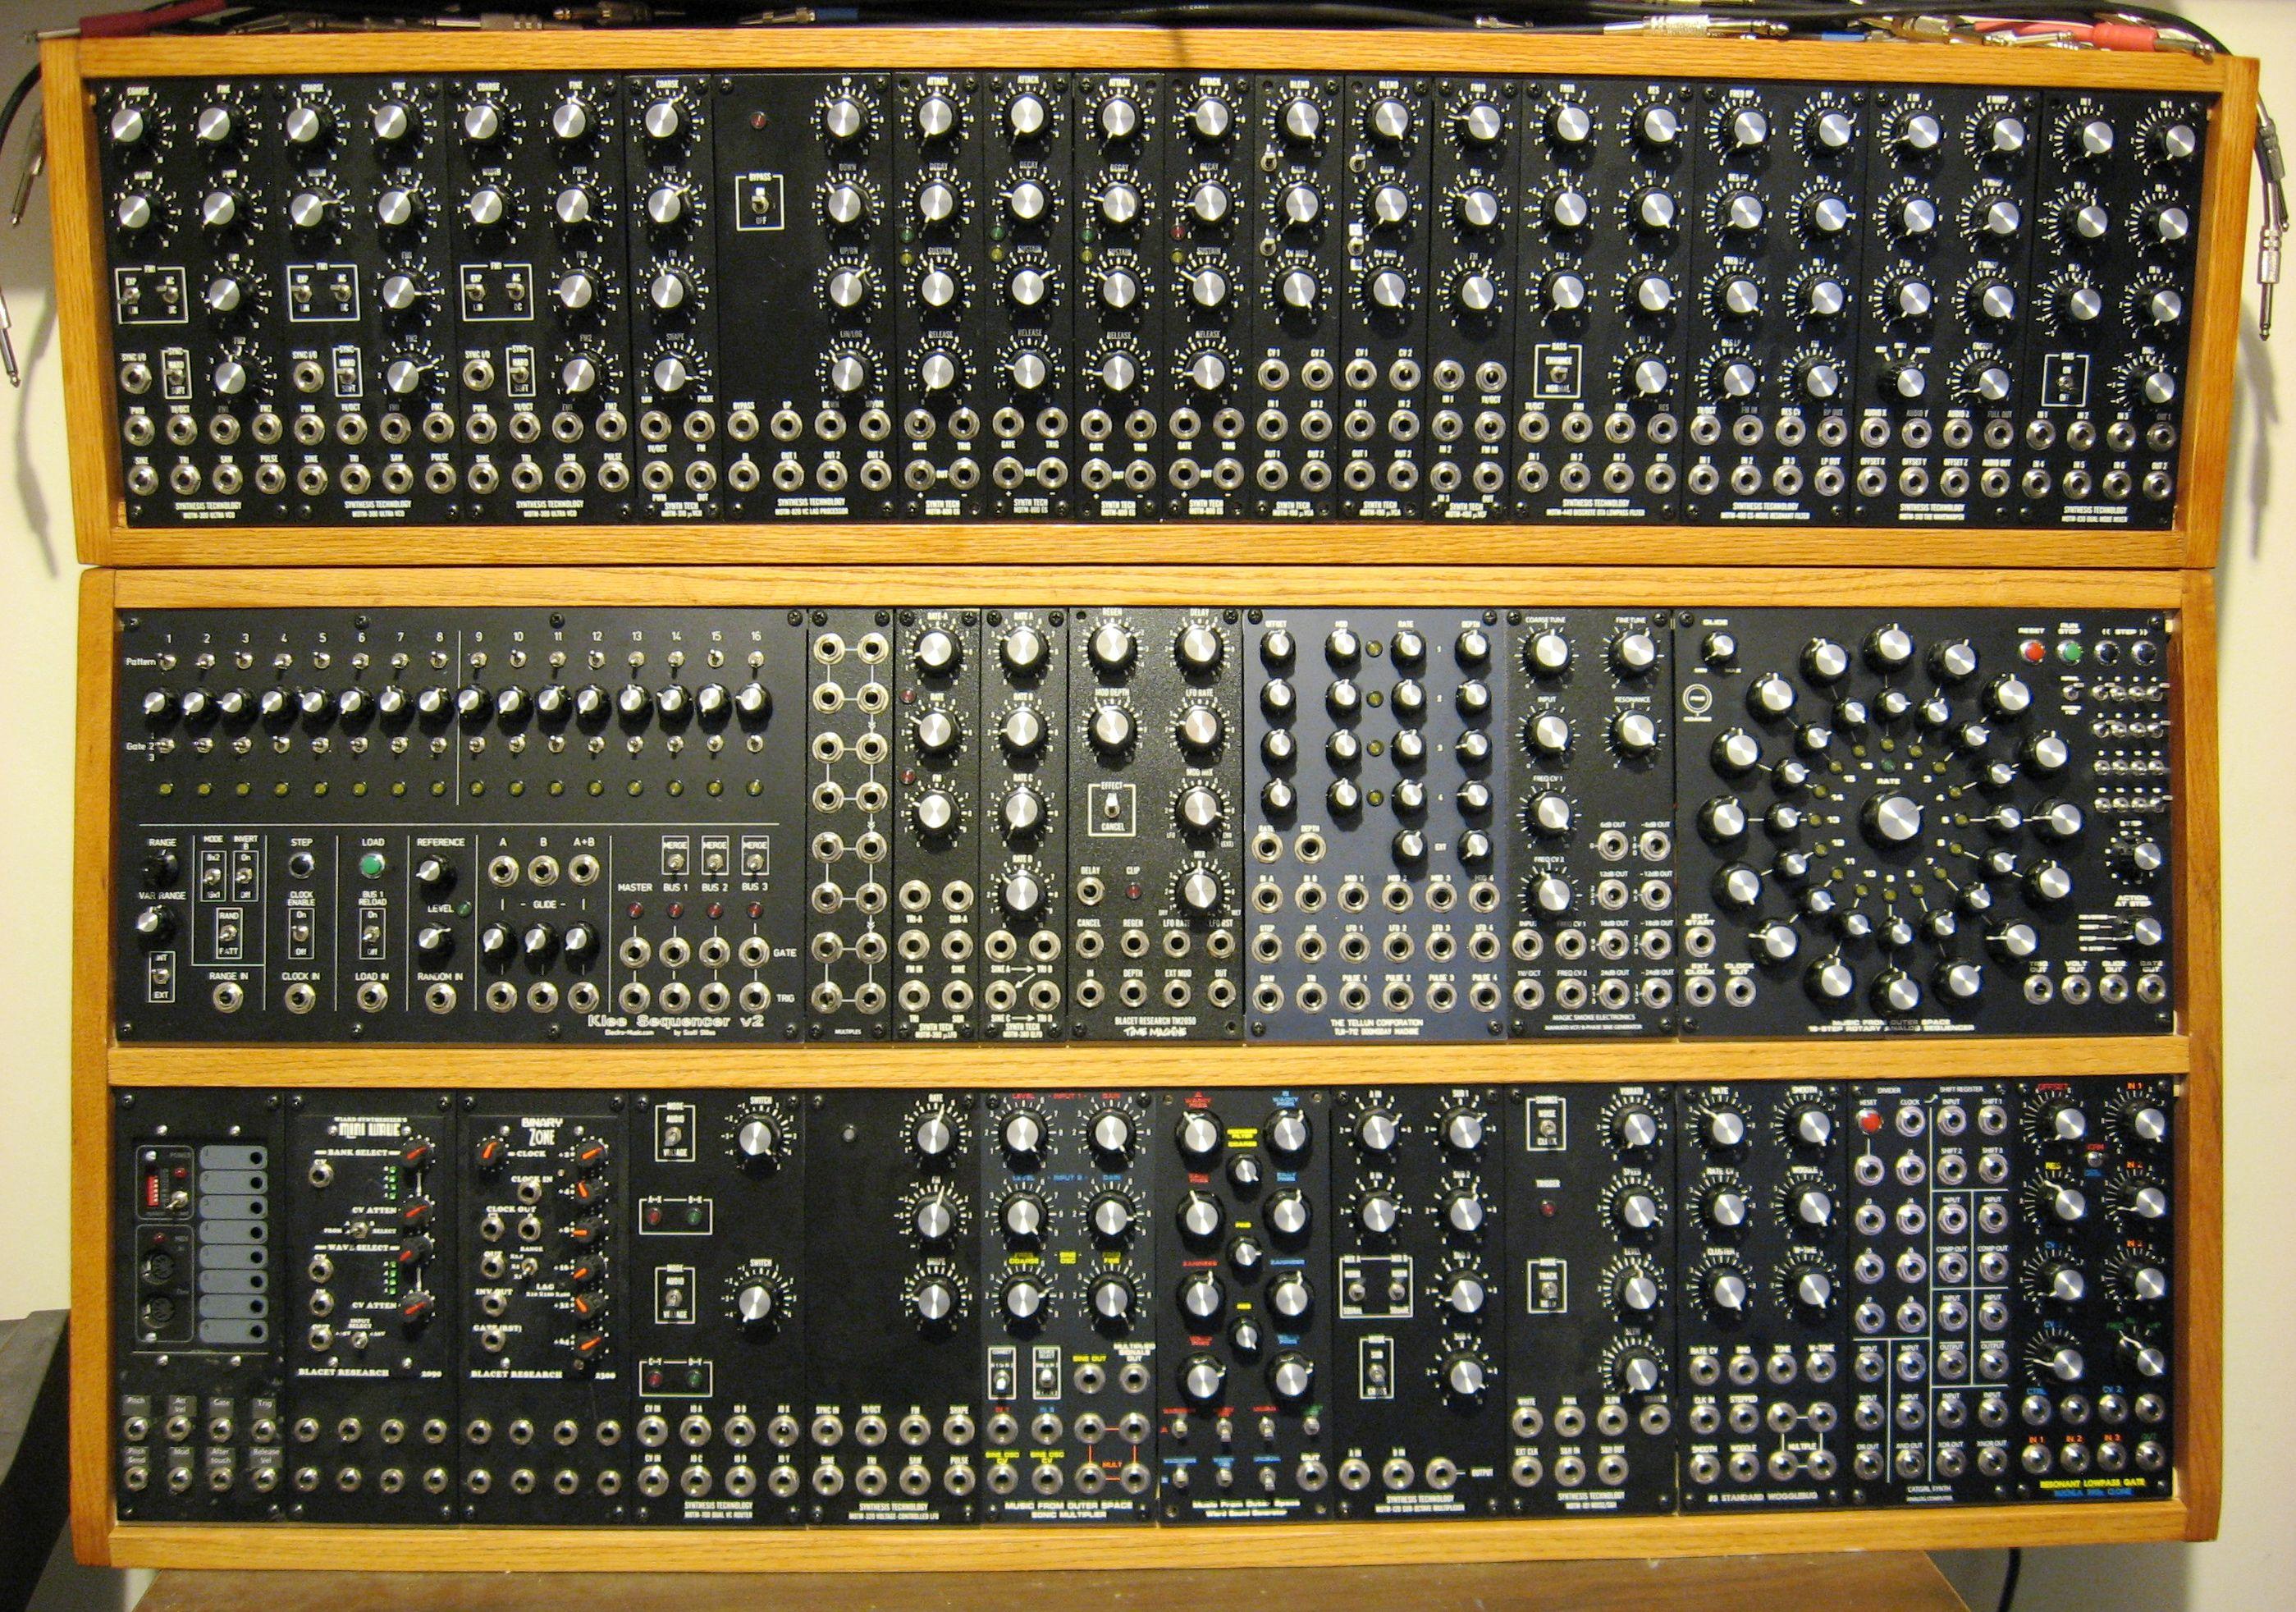 1000  images about Moog Modular Synthesizer 3c on Pinterest ...